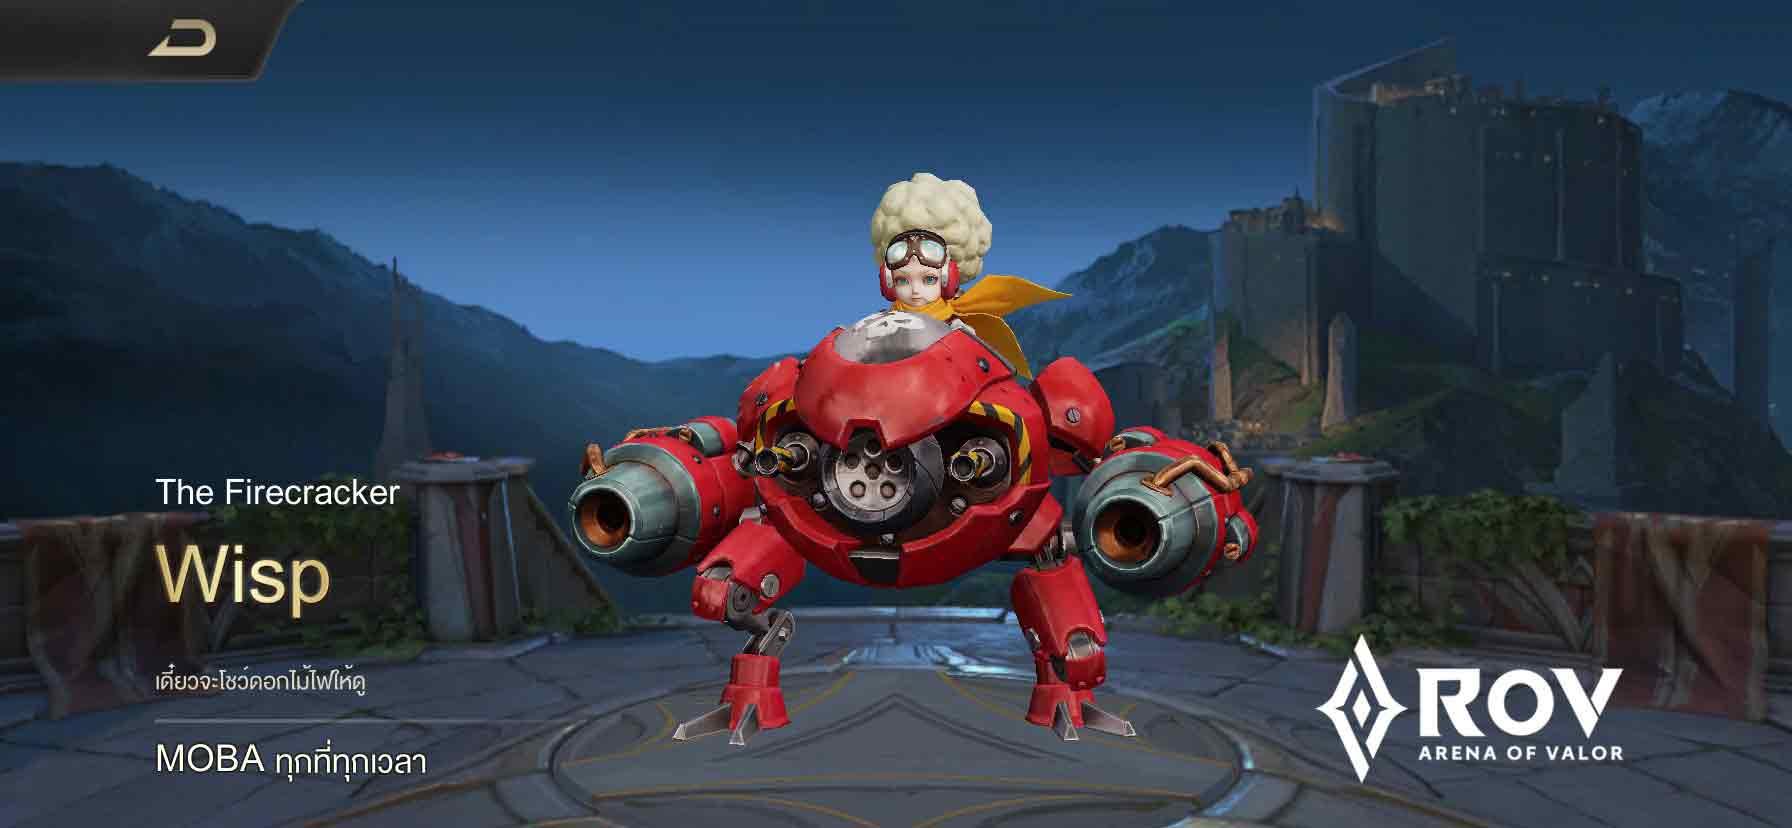 ROV-ตัวละคร-ที่คนนิยมเล่นใน-Meta-นี้1